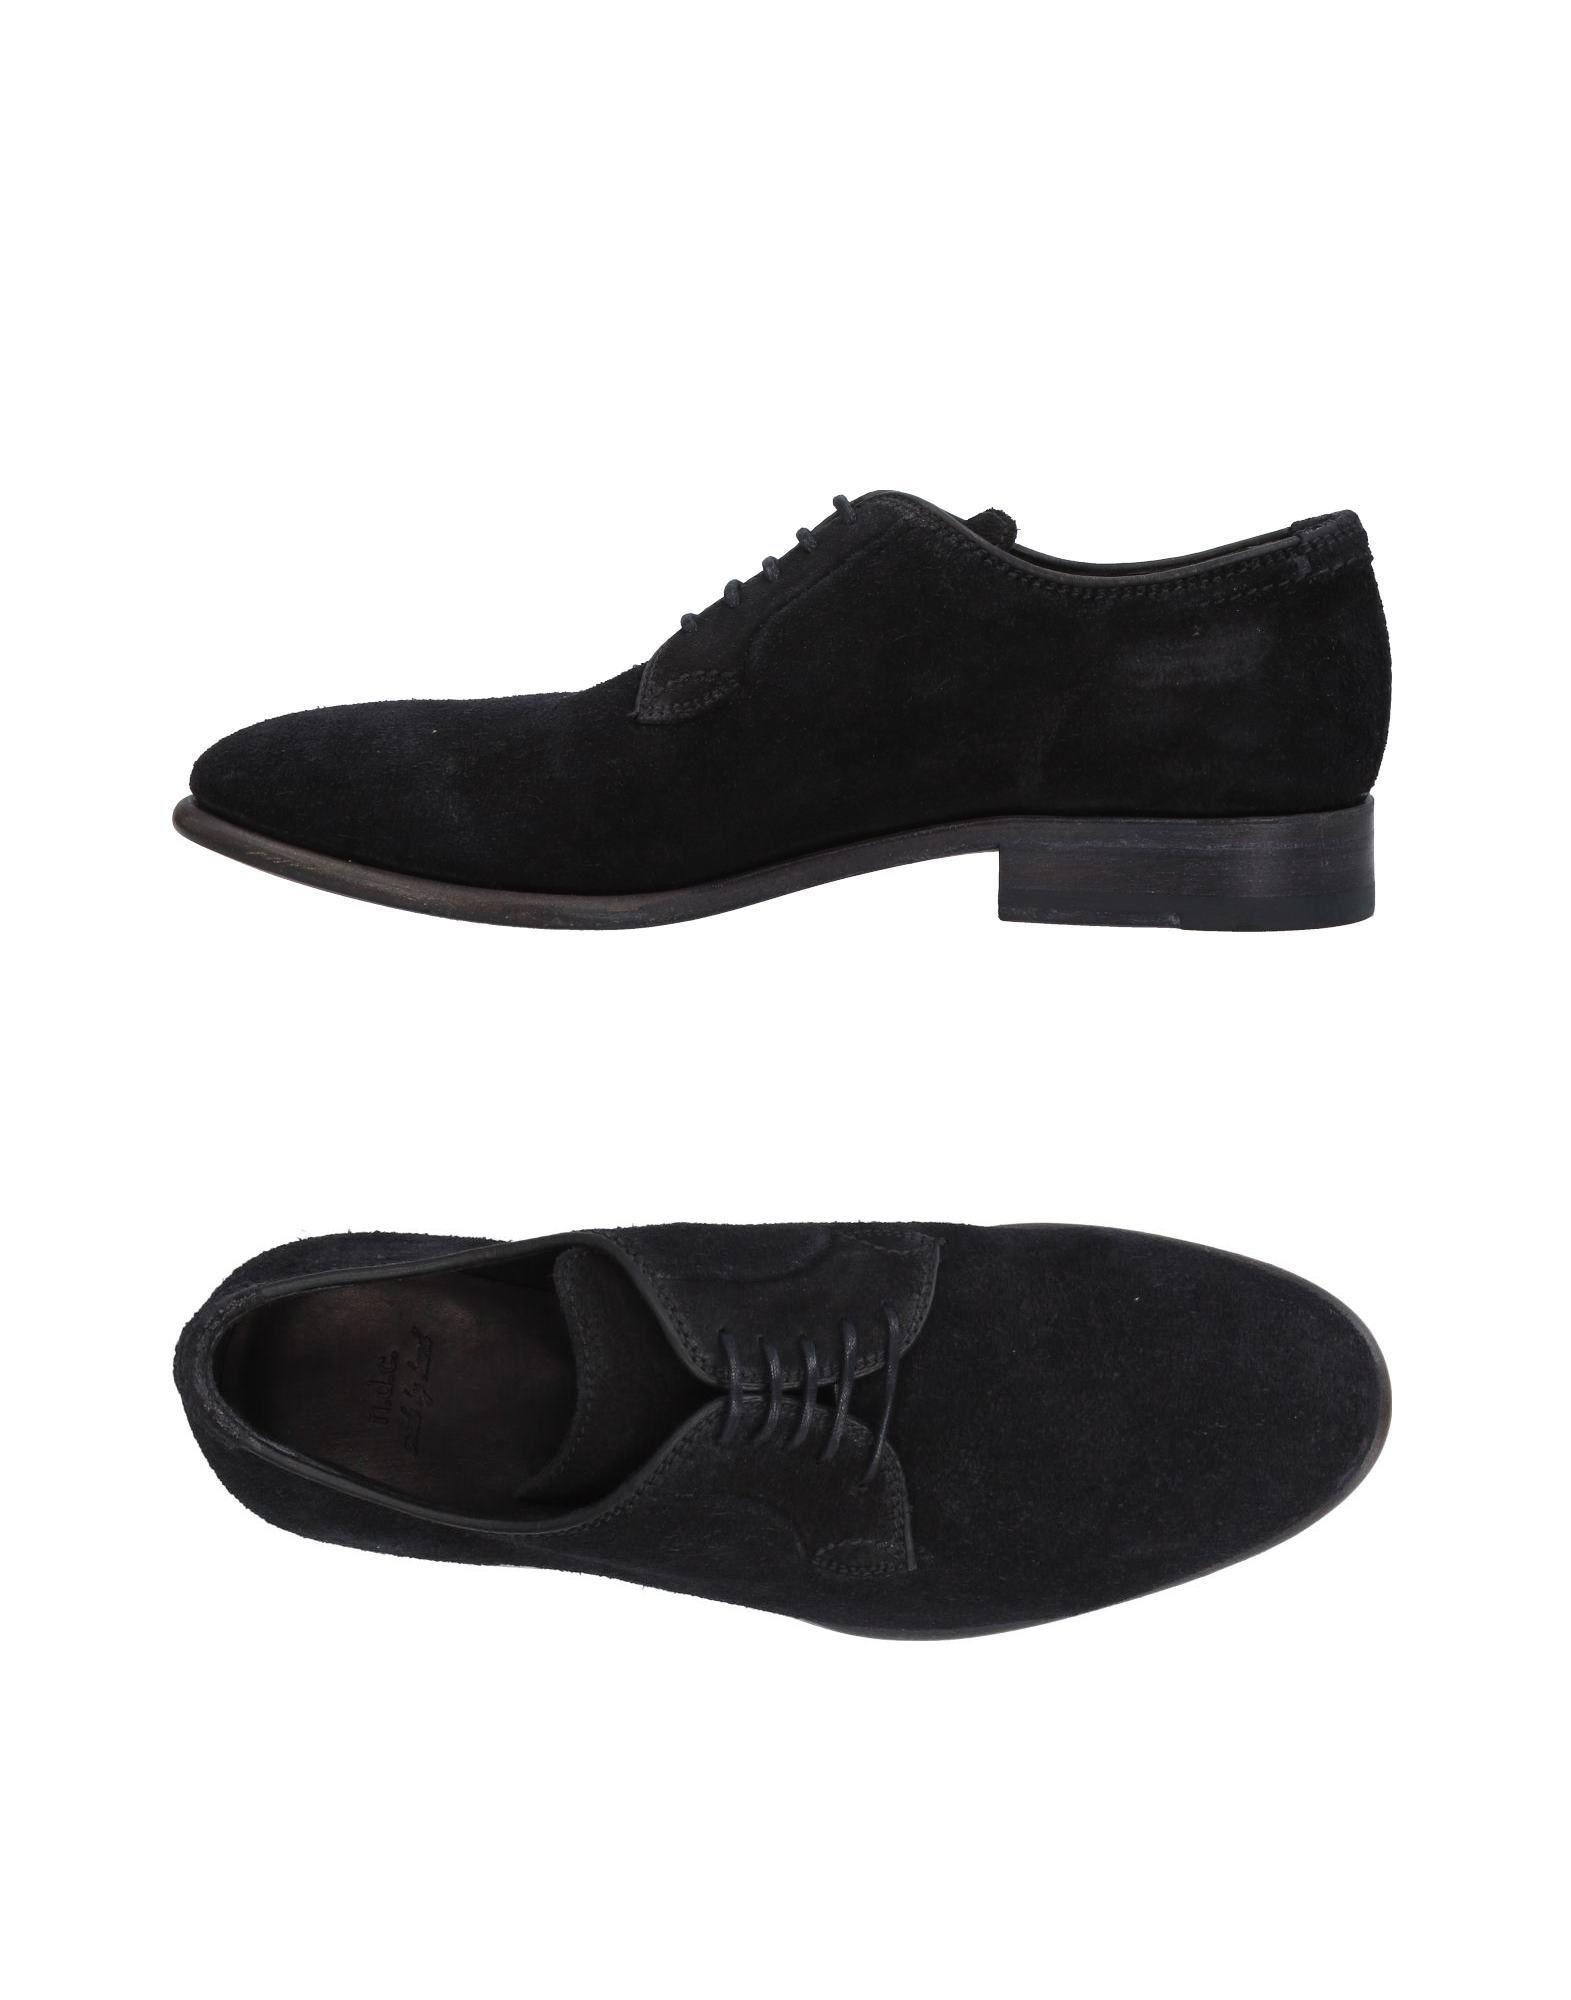 FOOTWEAR - Lace-up shoes N.D.C. HeBgLco